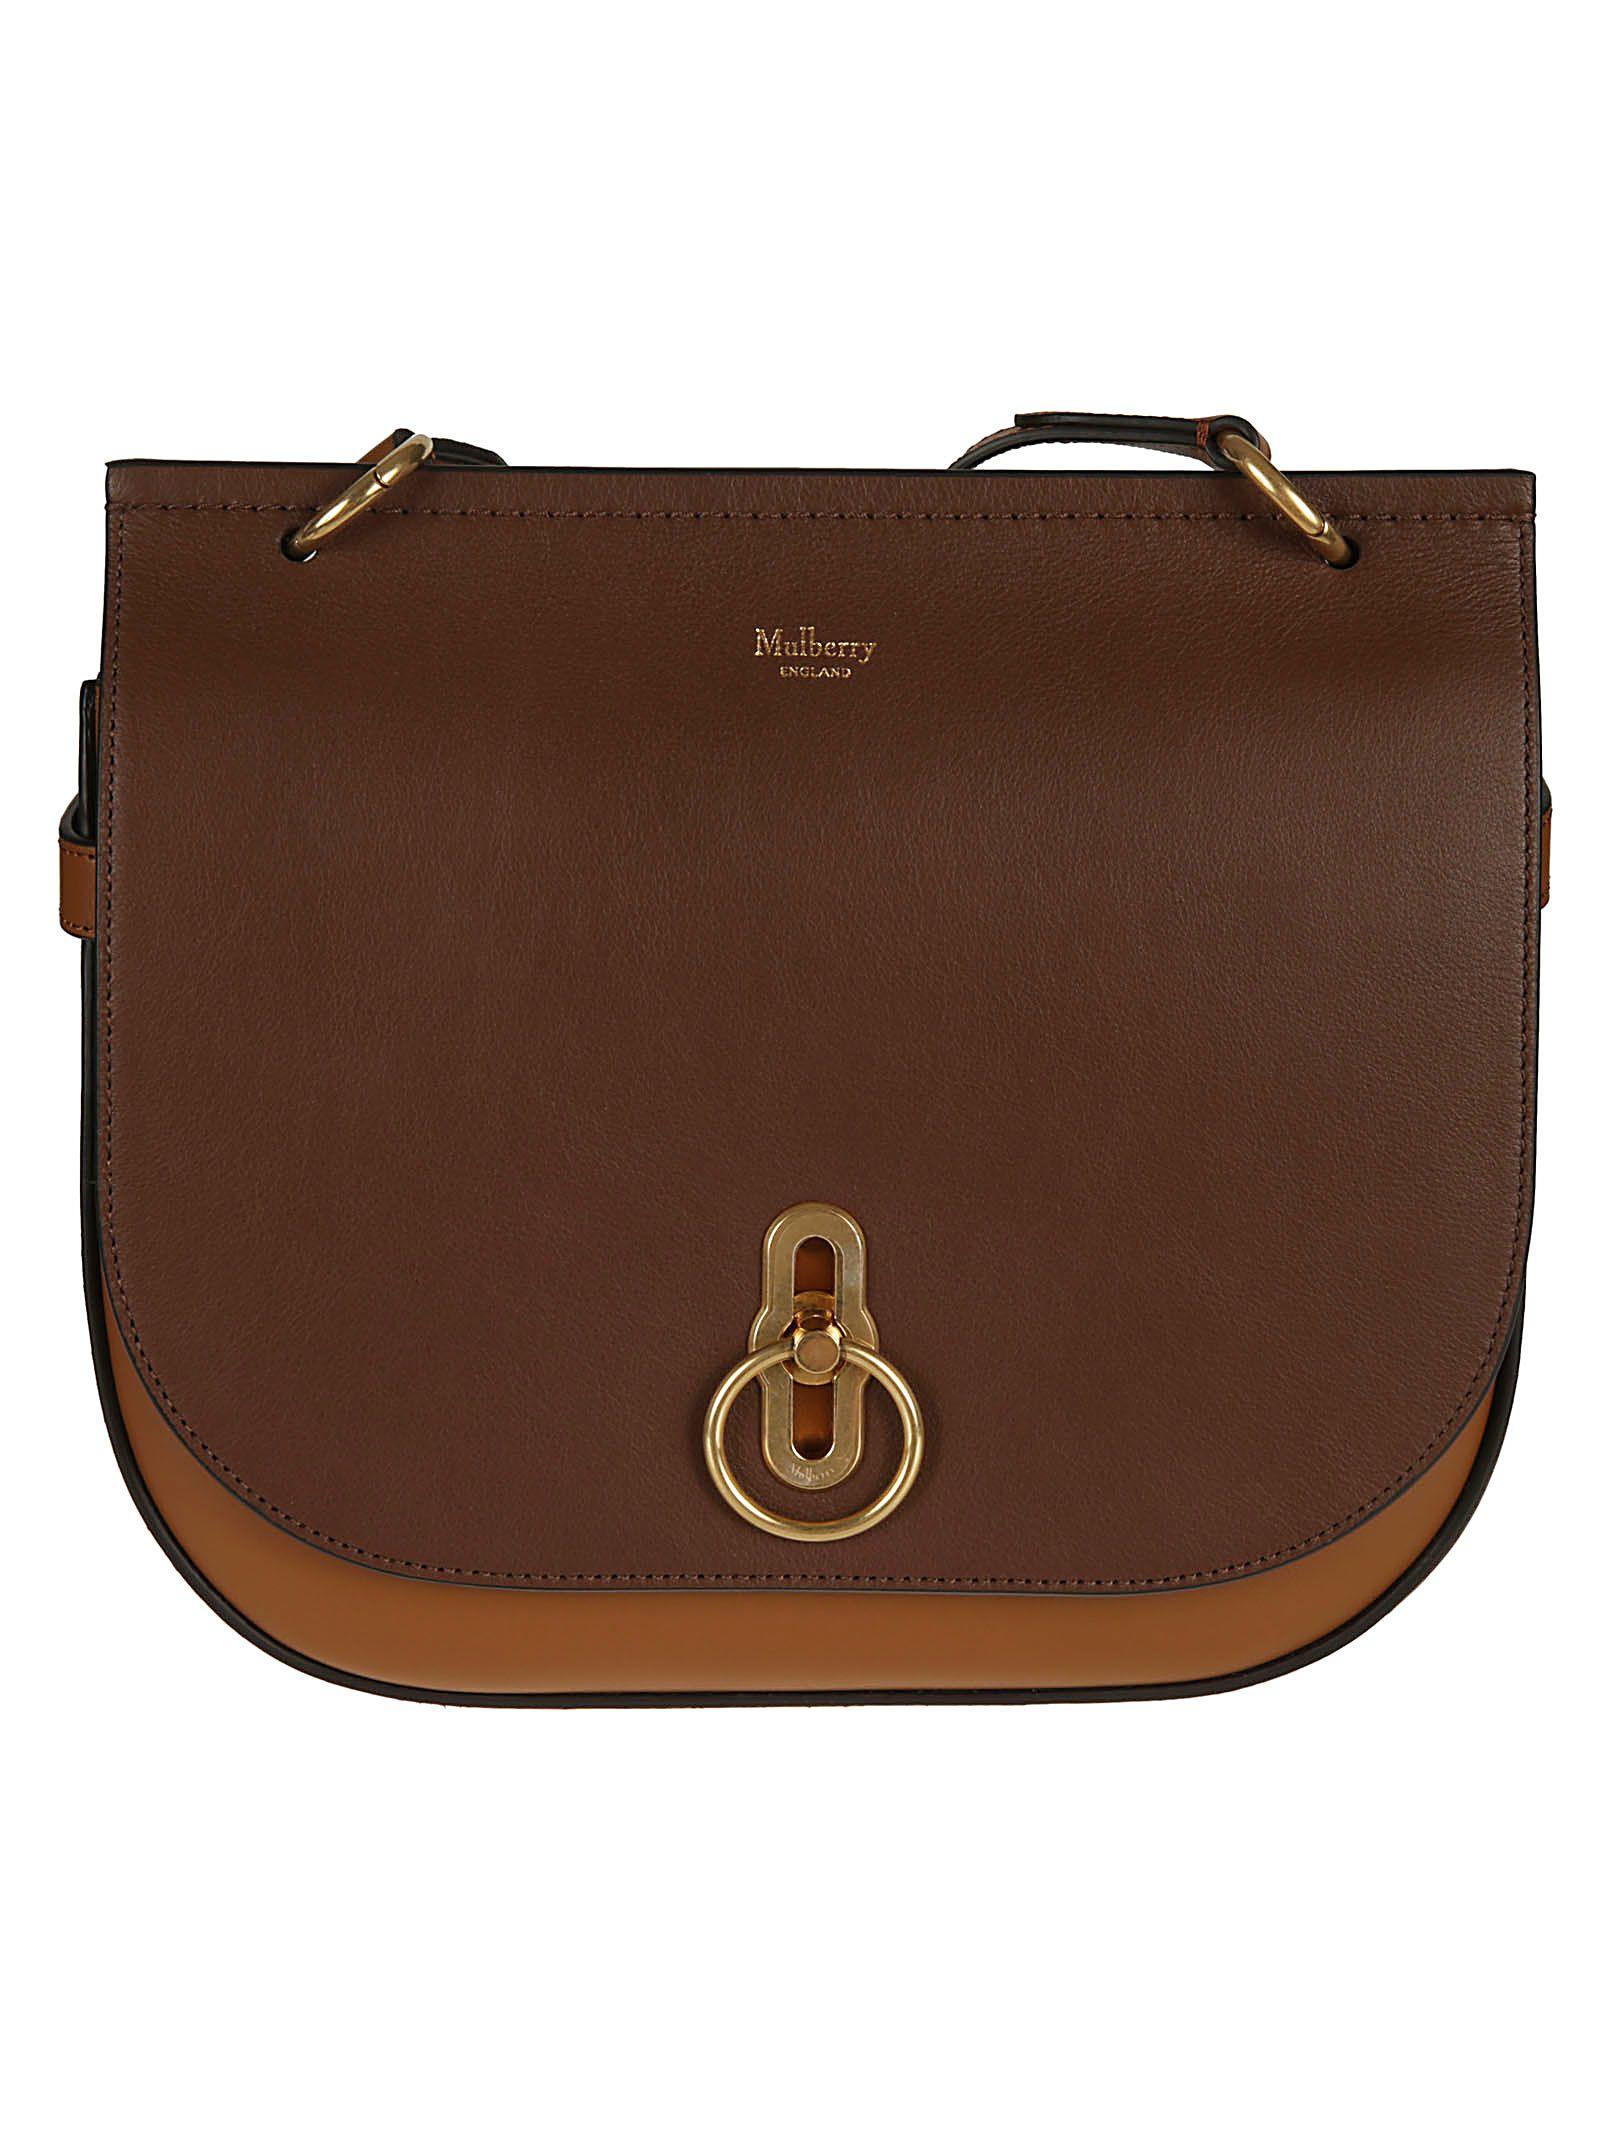 Amberley Shoulder Bag, Tobacco